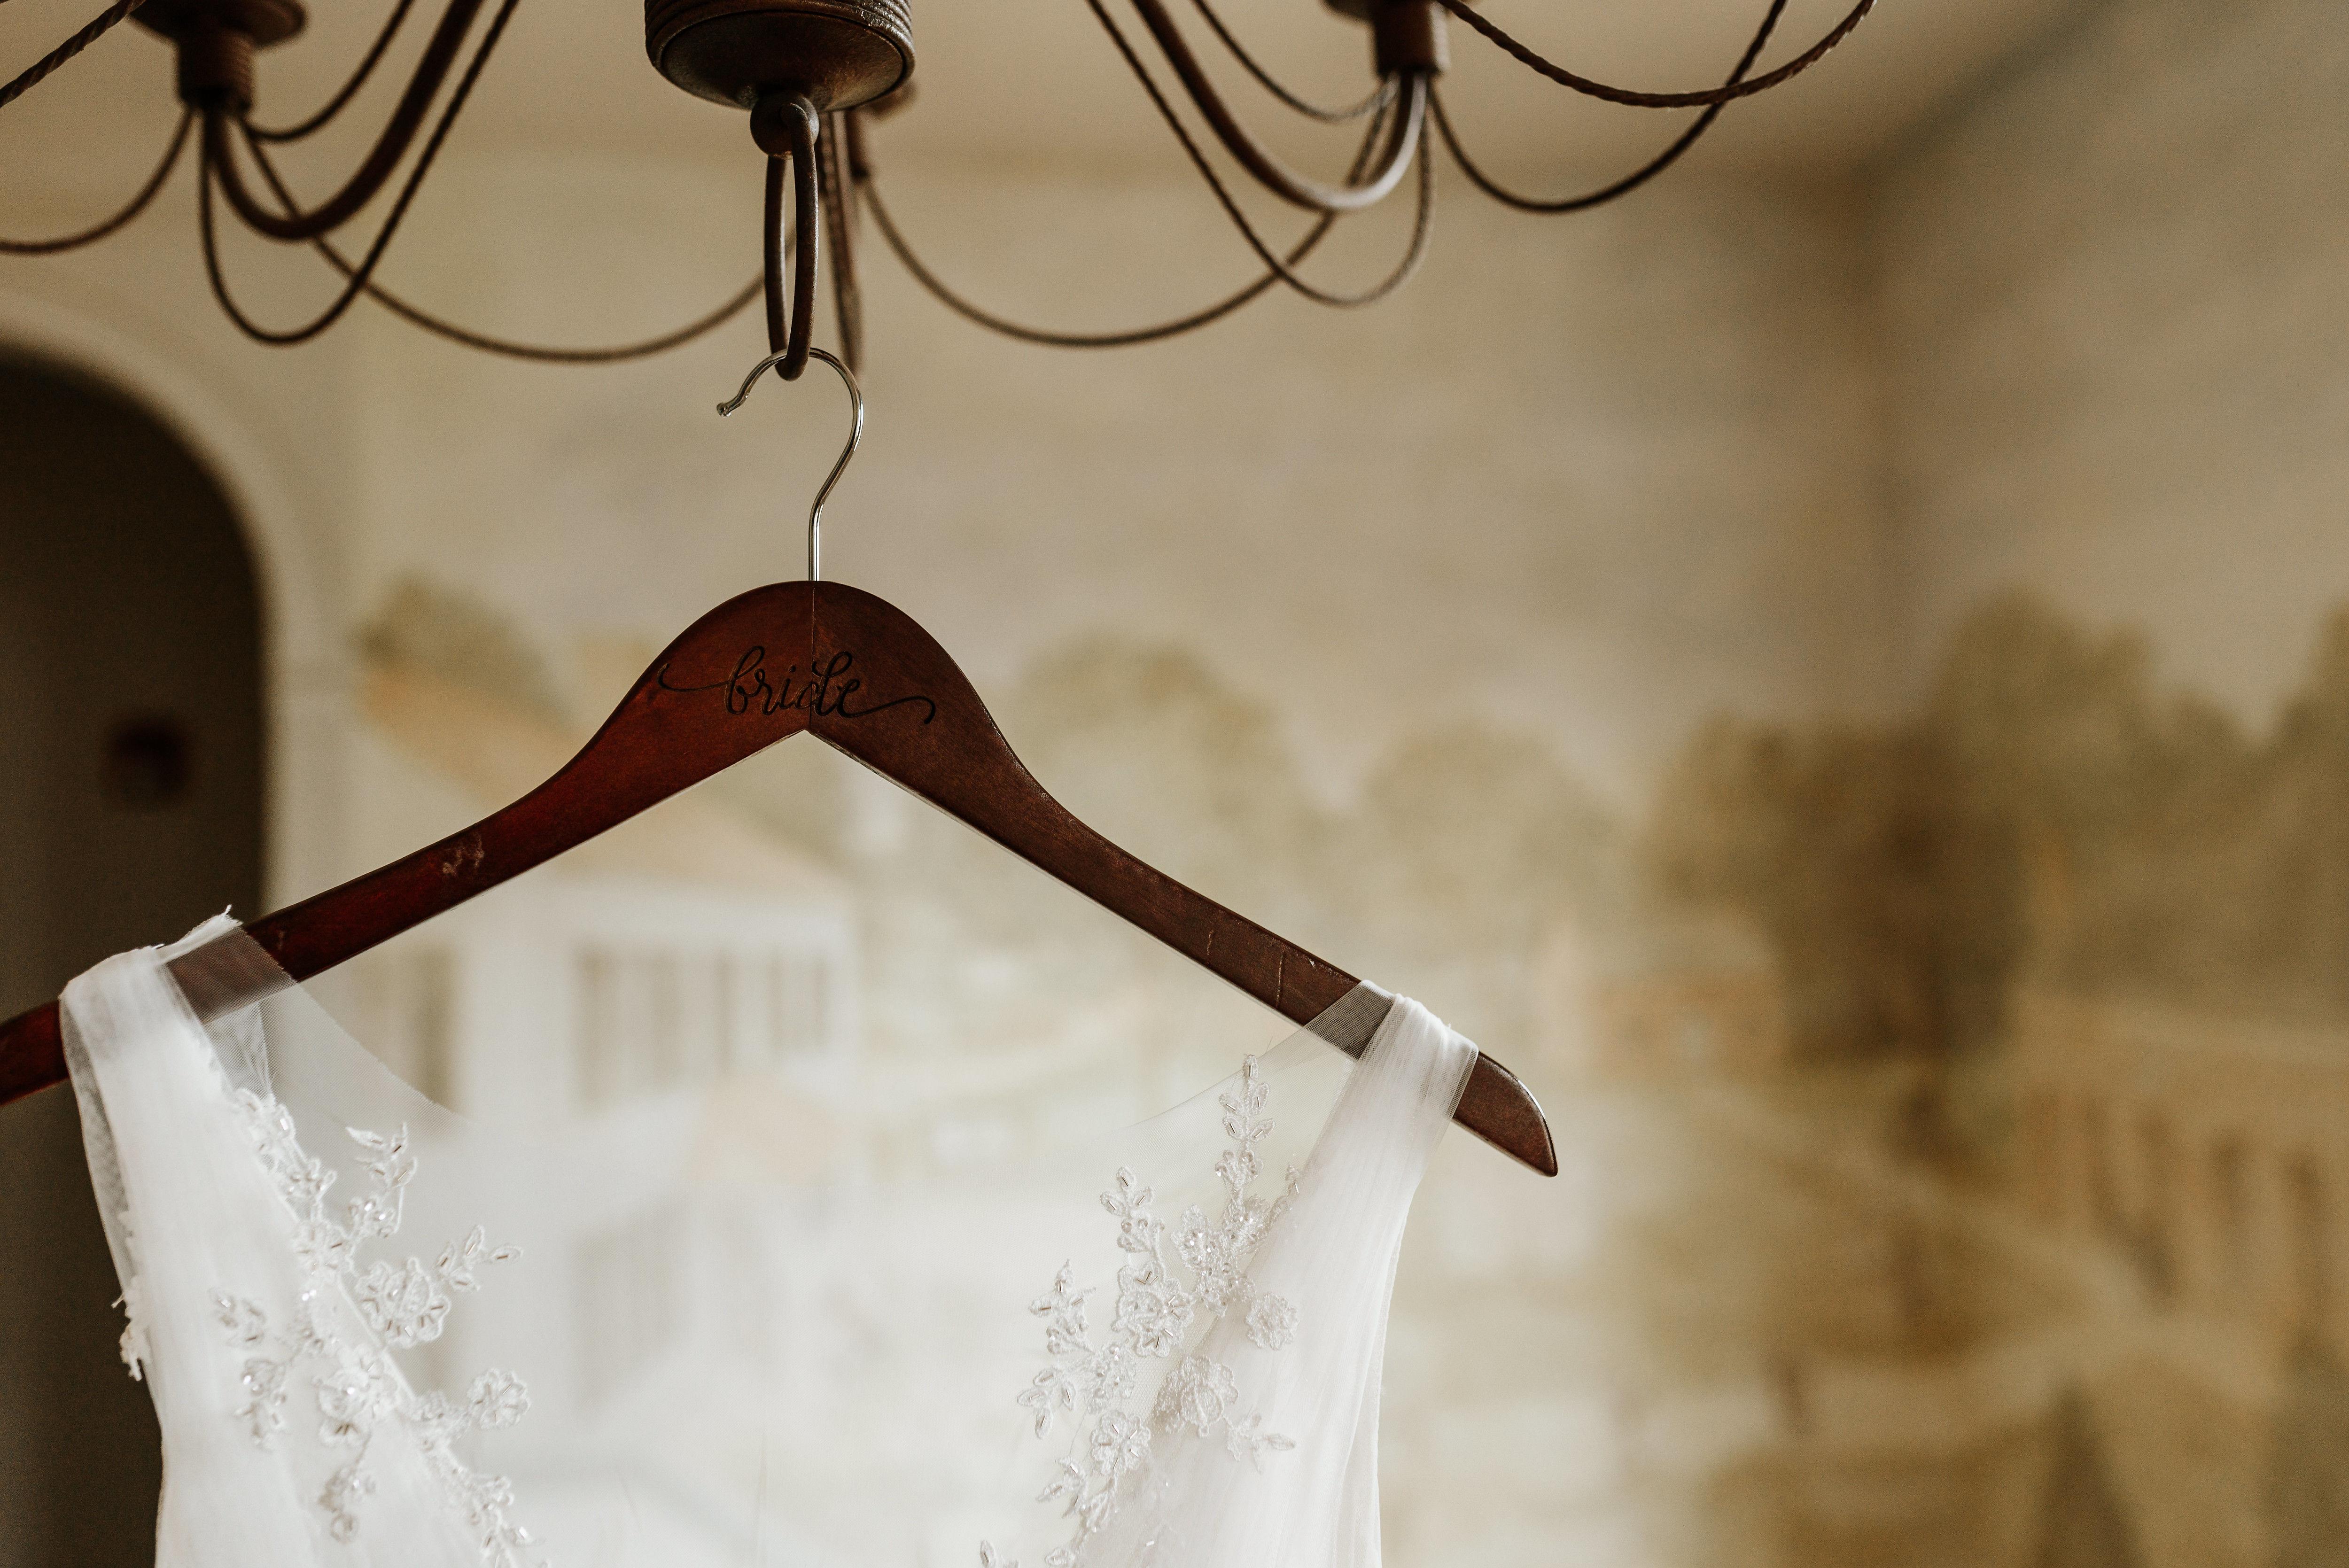 Hanover_Tavern_Wedding_Tori_Jared_Photography_by_V_1221